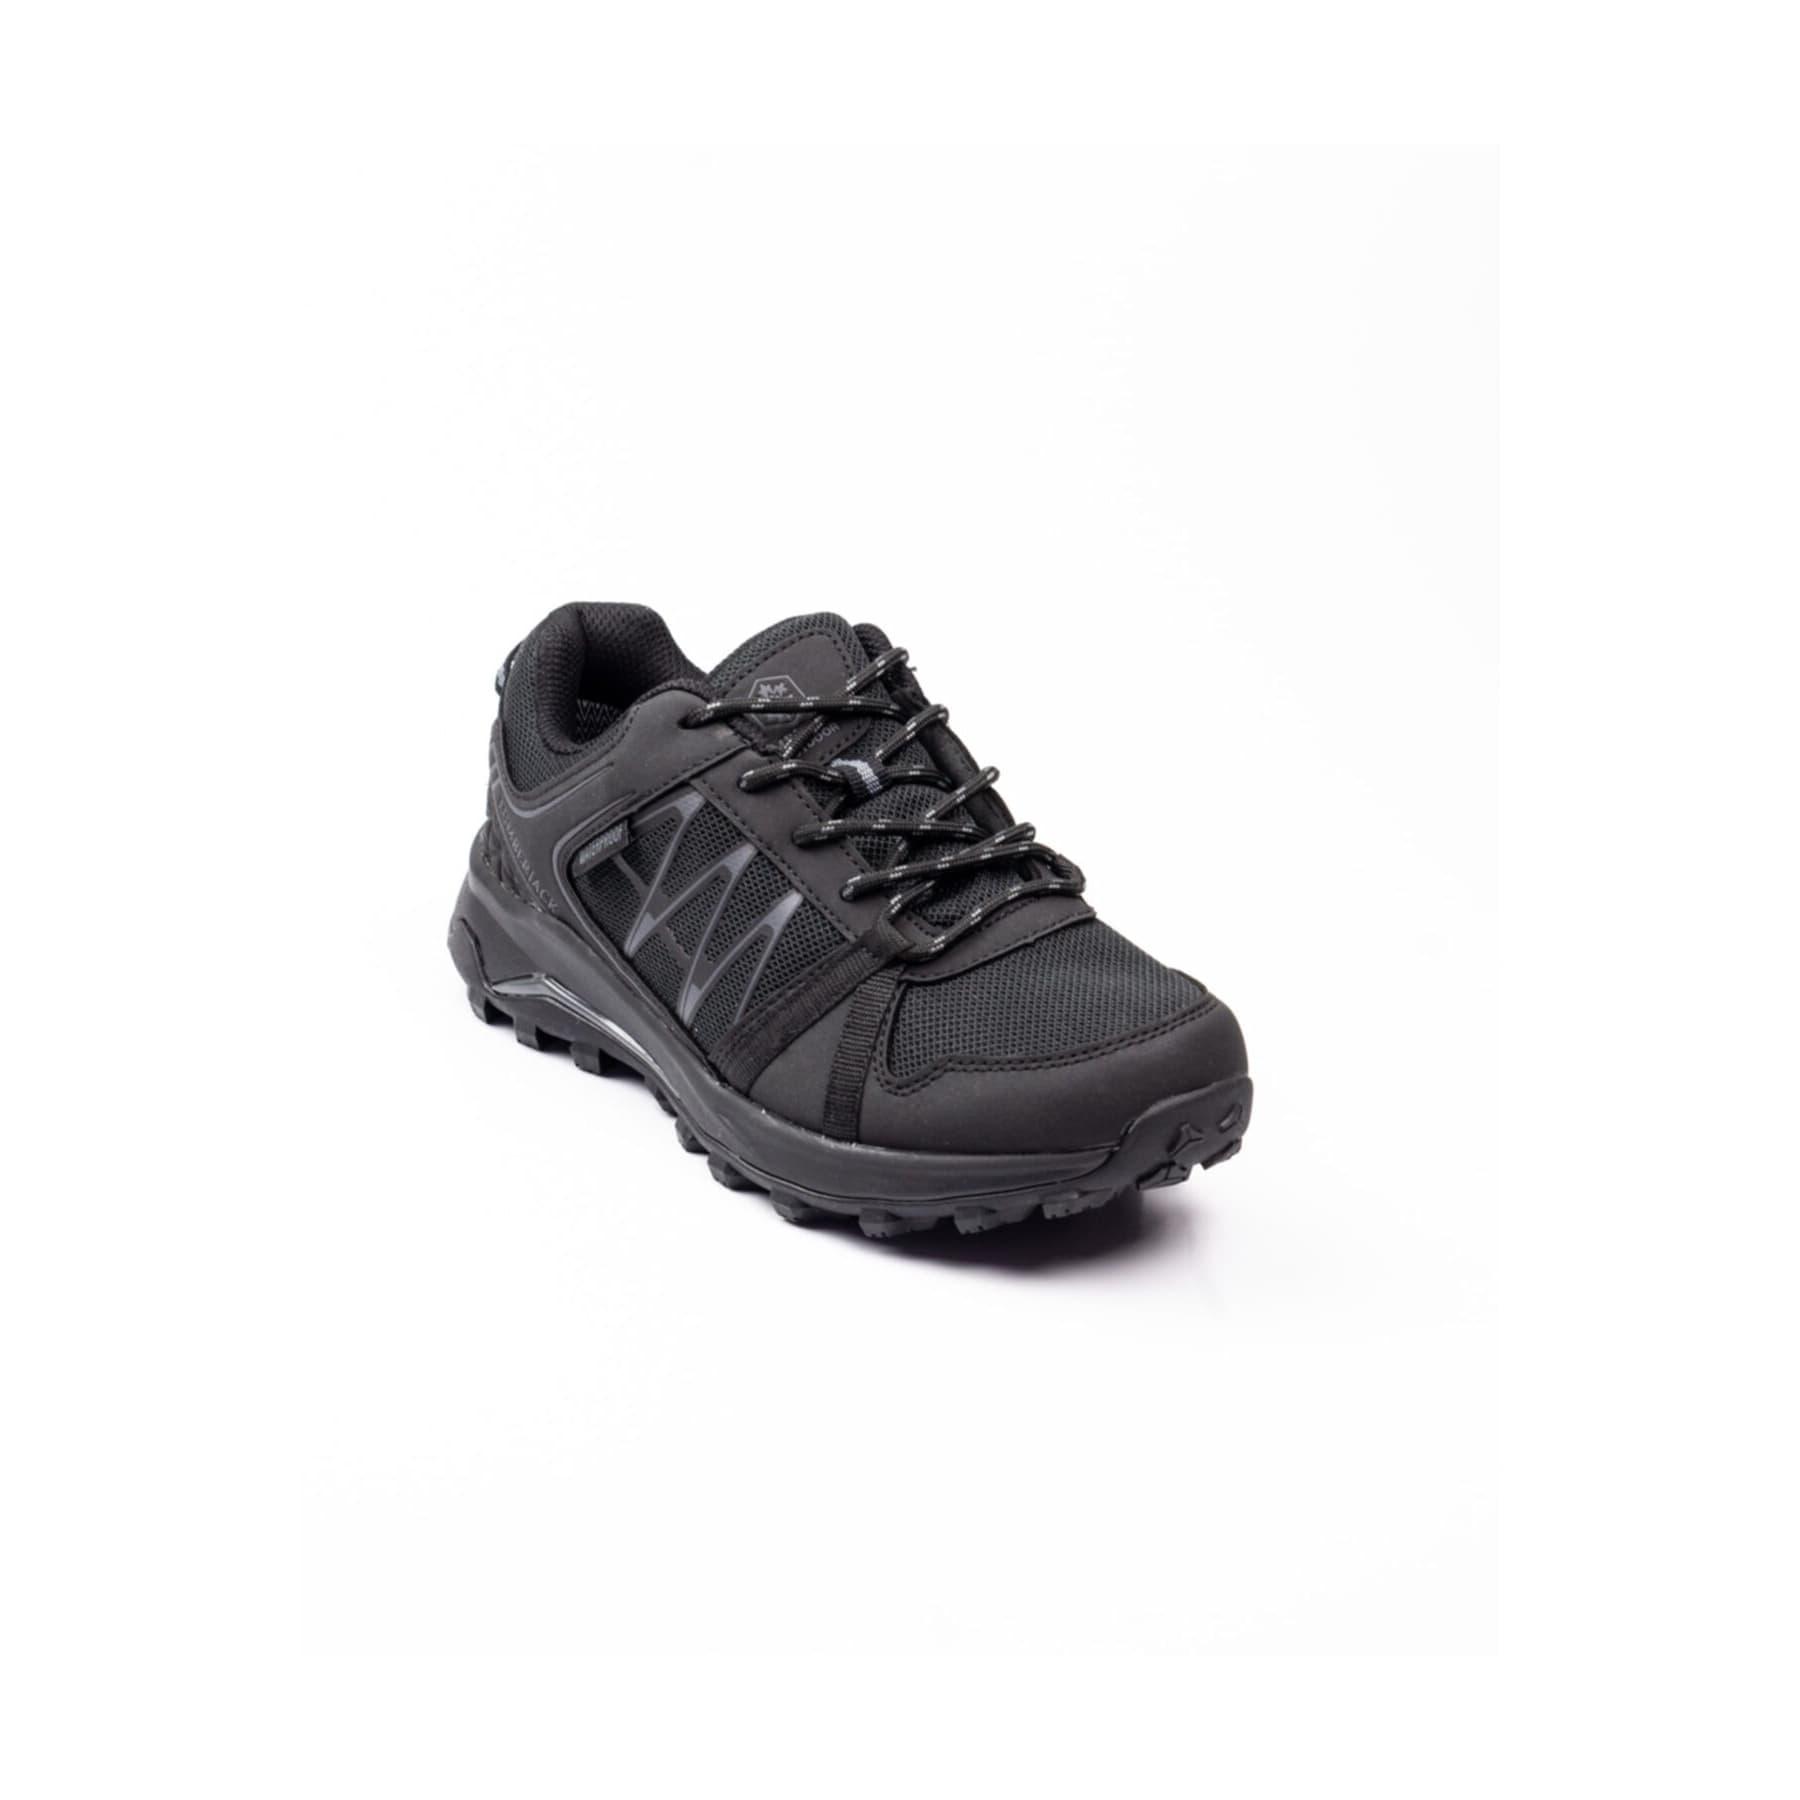 0W Brontes Kadın Siyah Outdoor Ayakkabı